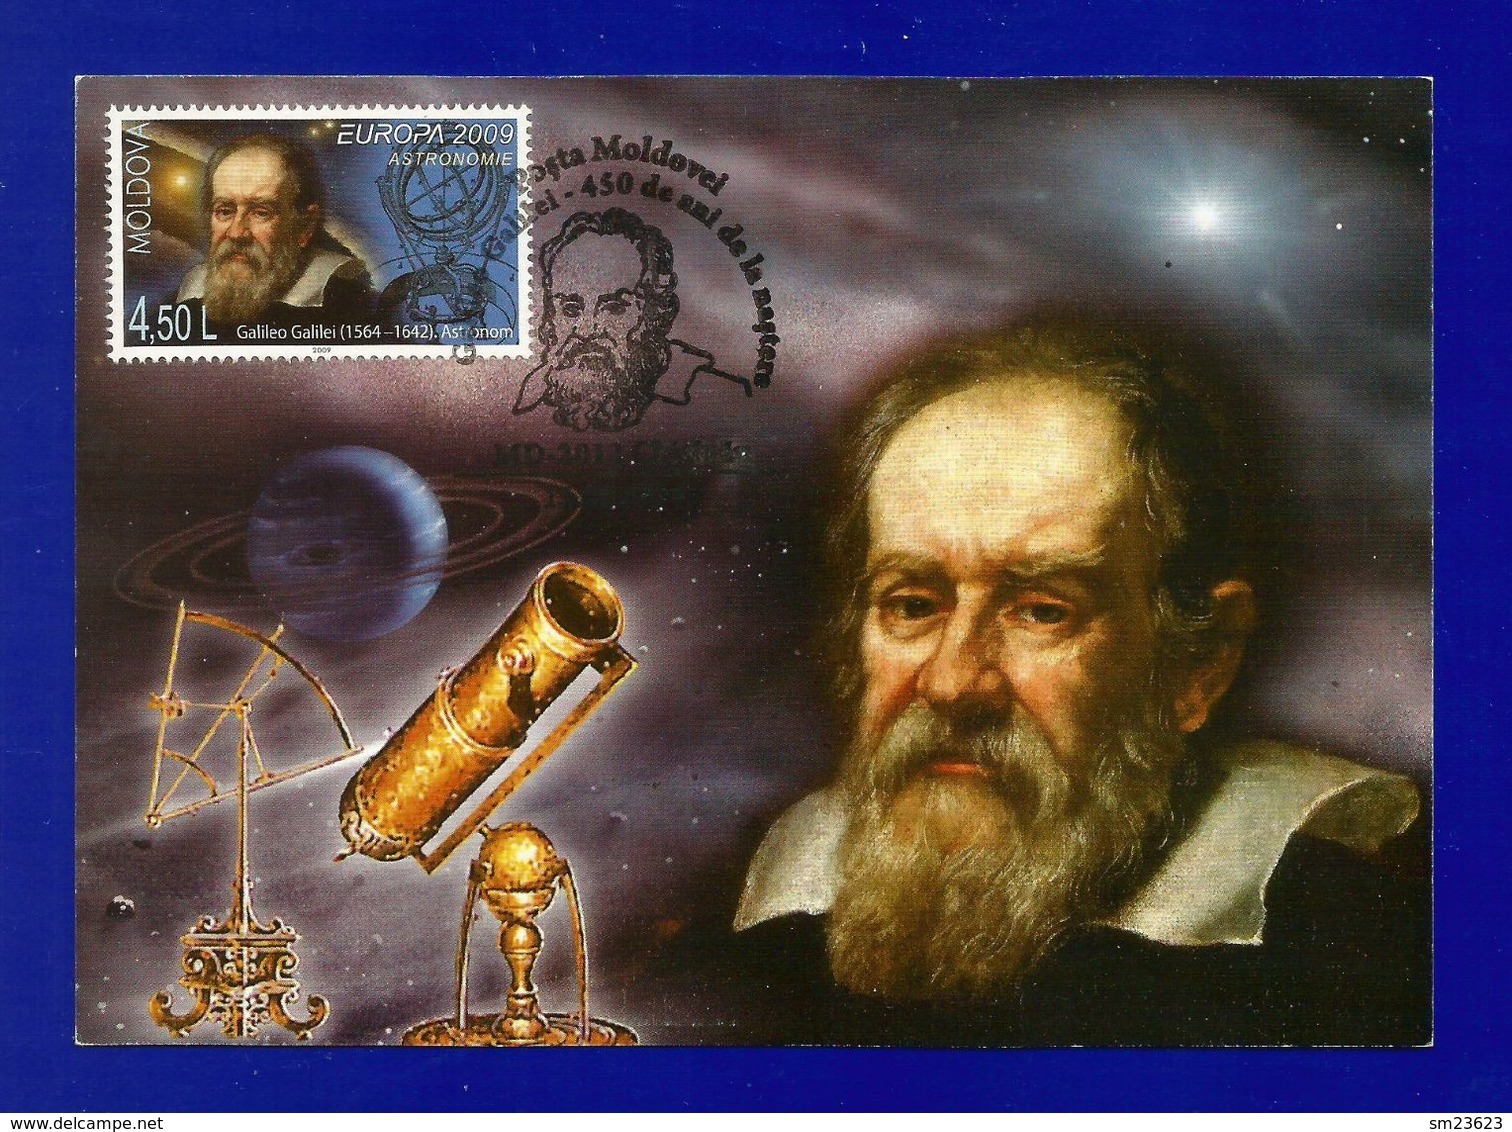 Moldovei 2009  Mi.Nr. 651 , EUROPA - CEPT  Astronomie Galileo Galilei - Maximum Karte - Erstausgabe Posta Moldovel - Europa-CEPT